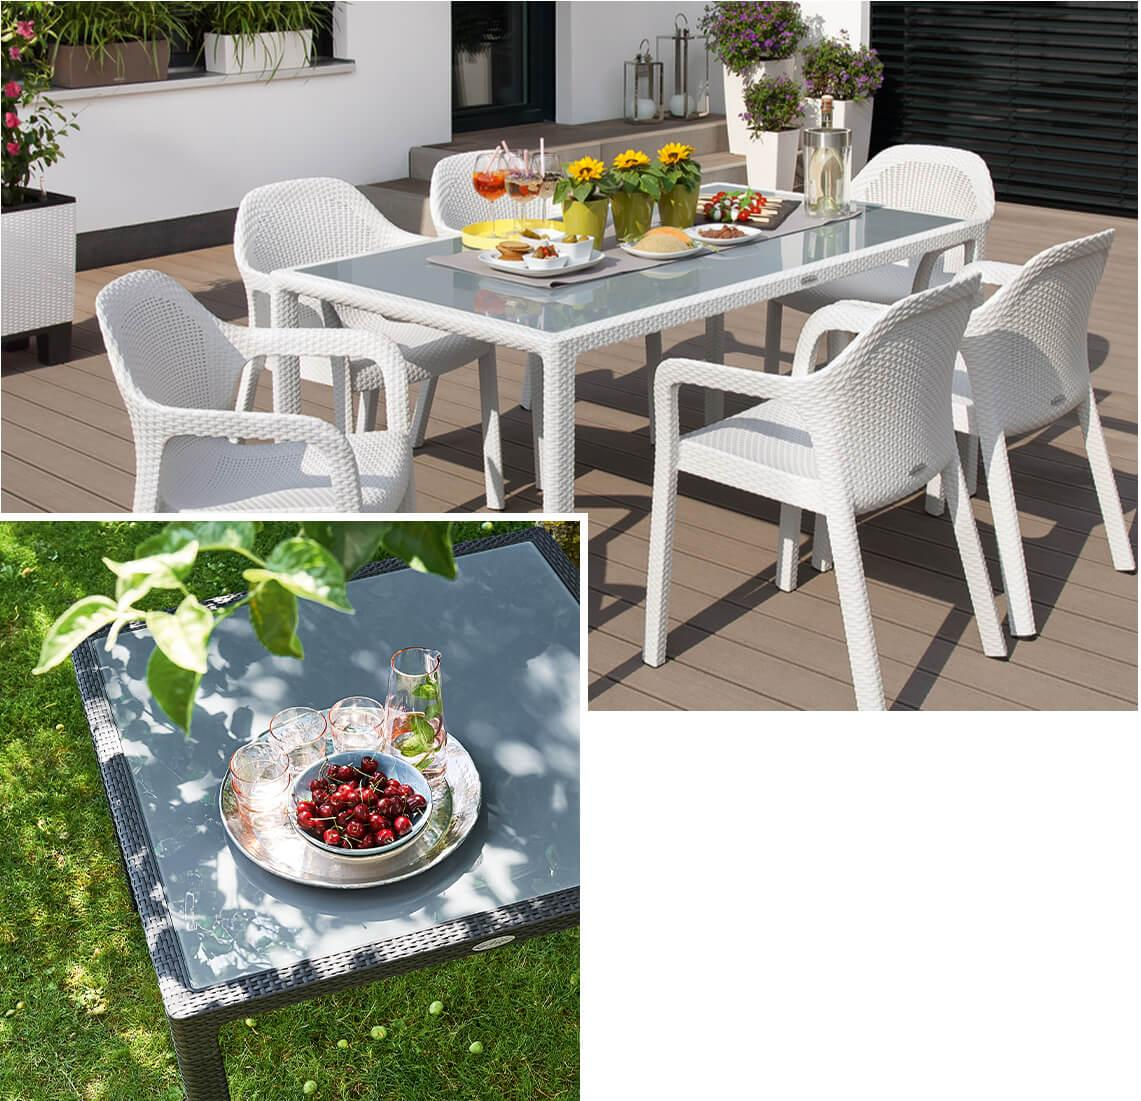 Tables de jardin LECHUZA disponibles en blanc et granit